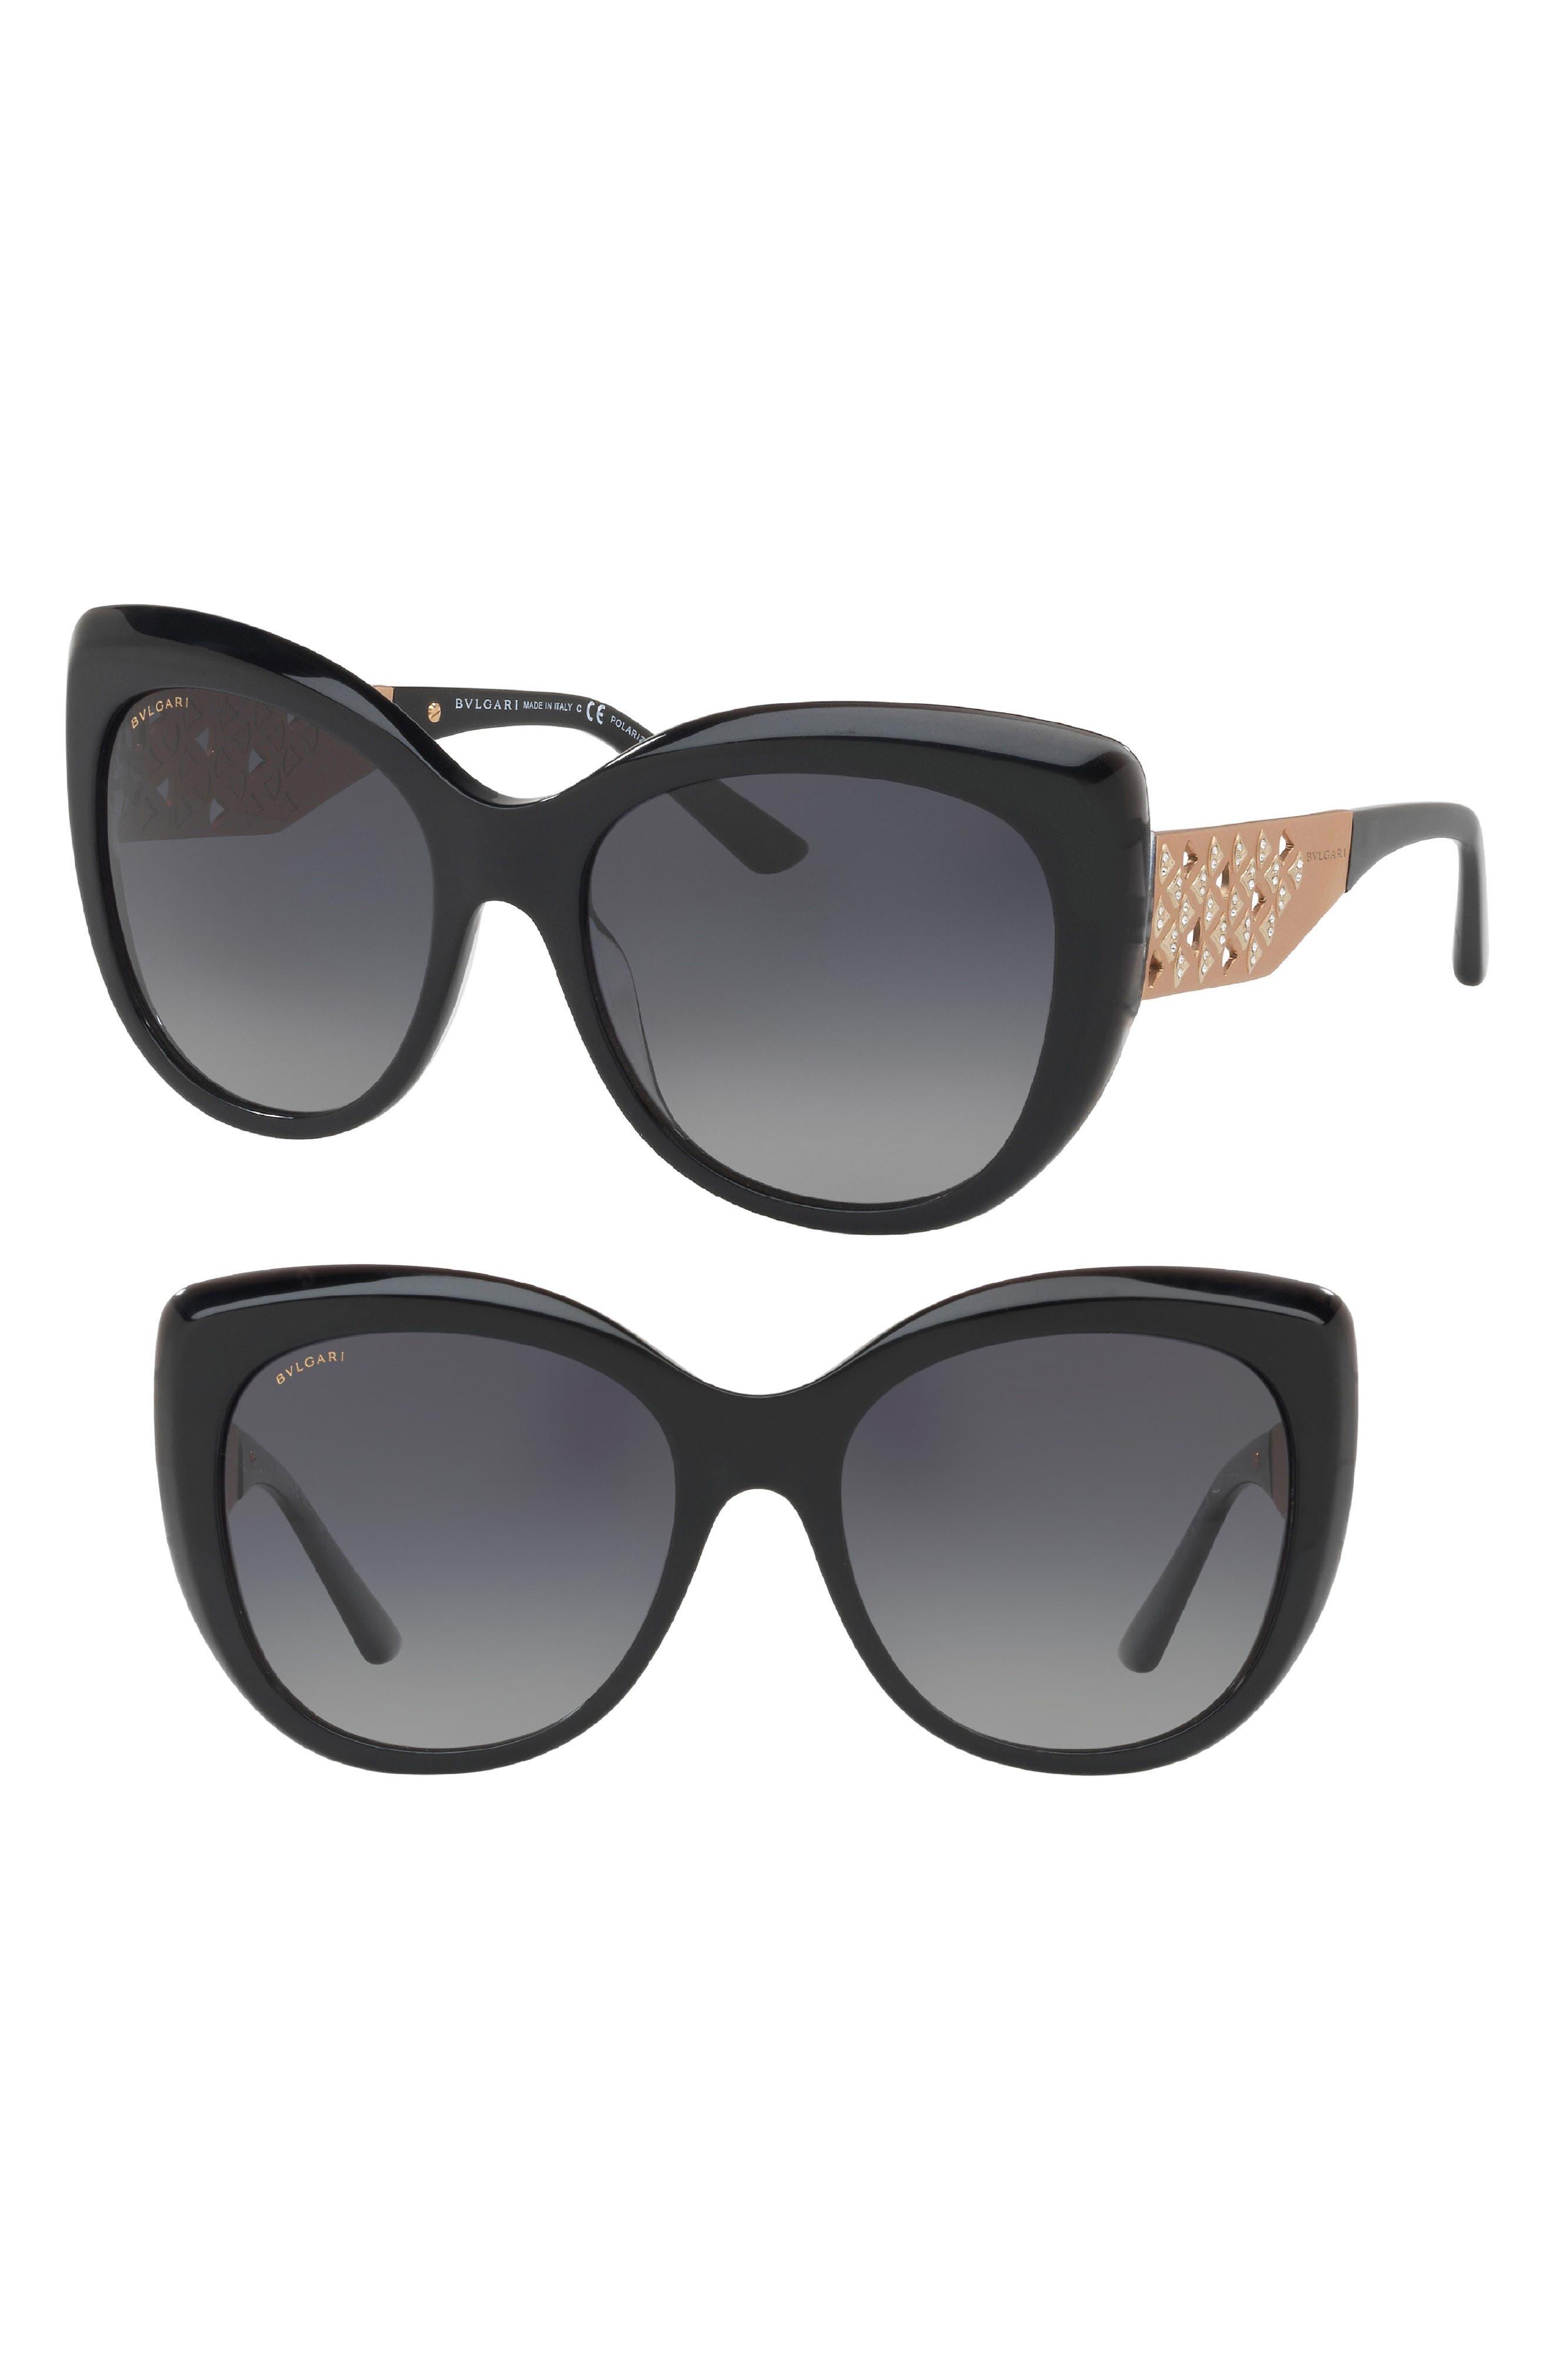 Main Image - BVLGARI 57mm Polarized Gradient Sunglasses